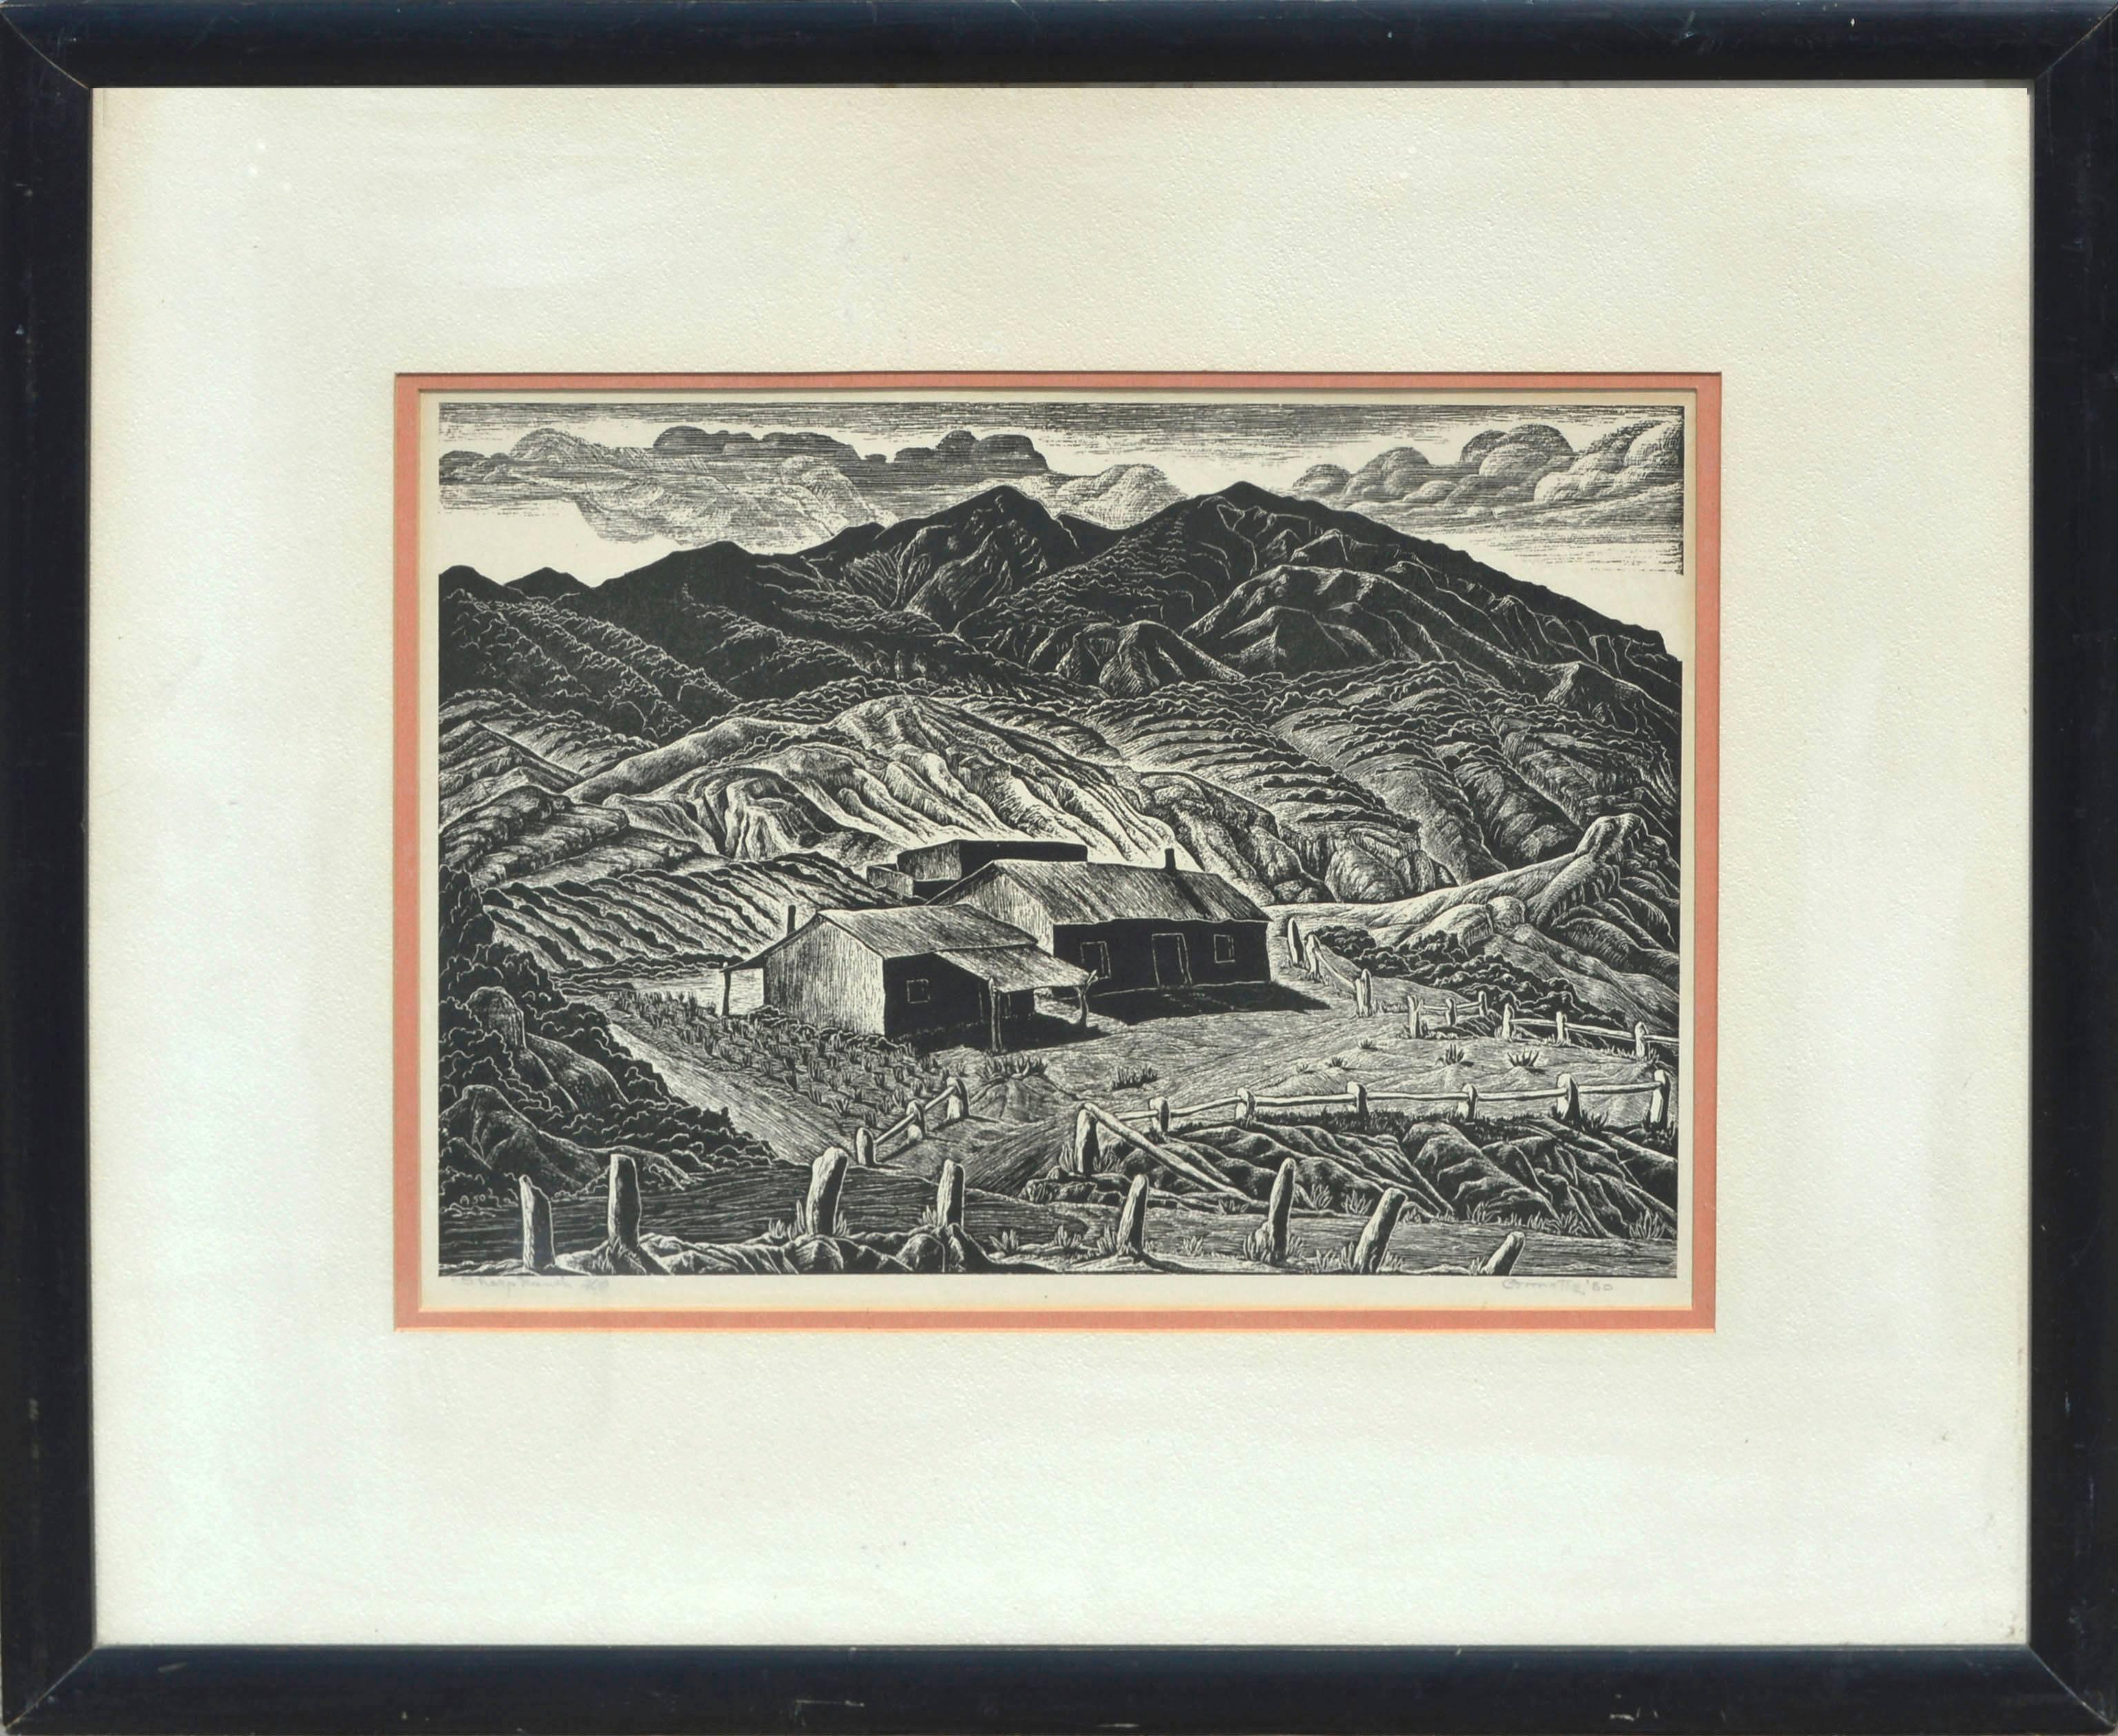 Mid Century Sheep Ranch Landscape Woodblock